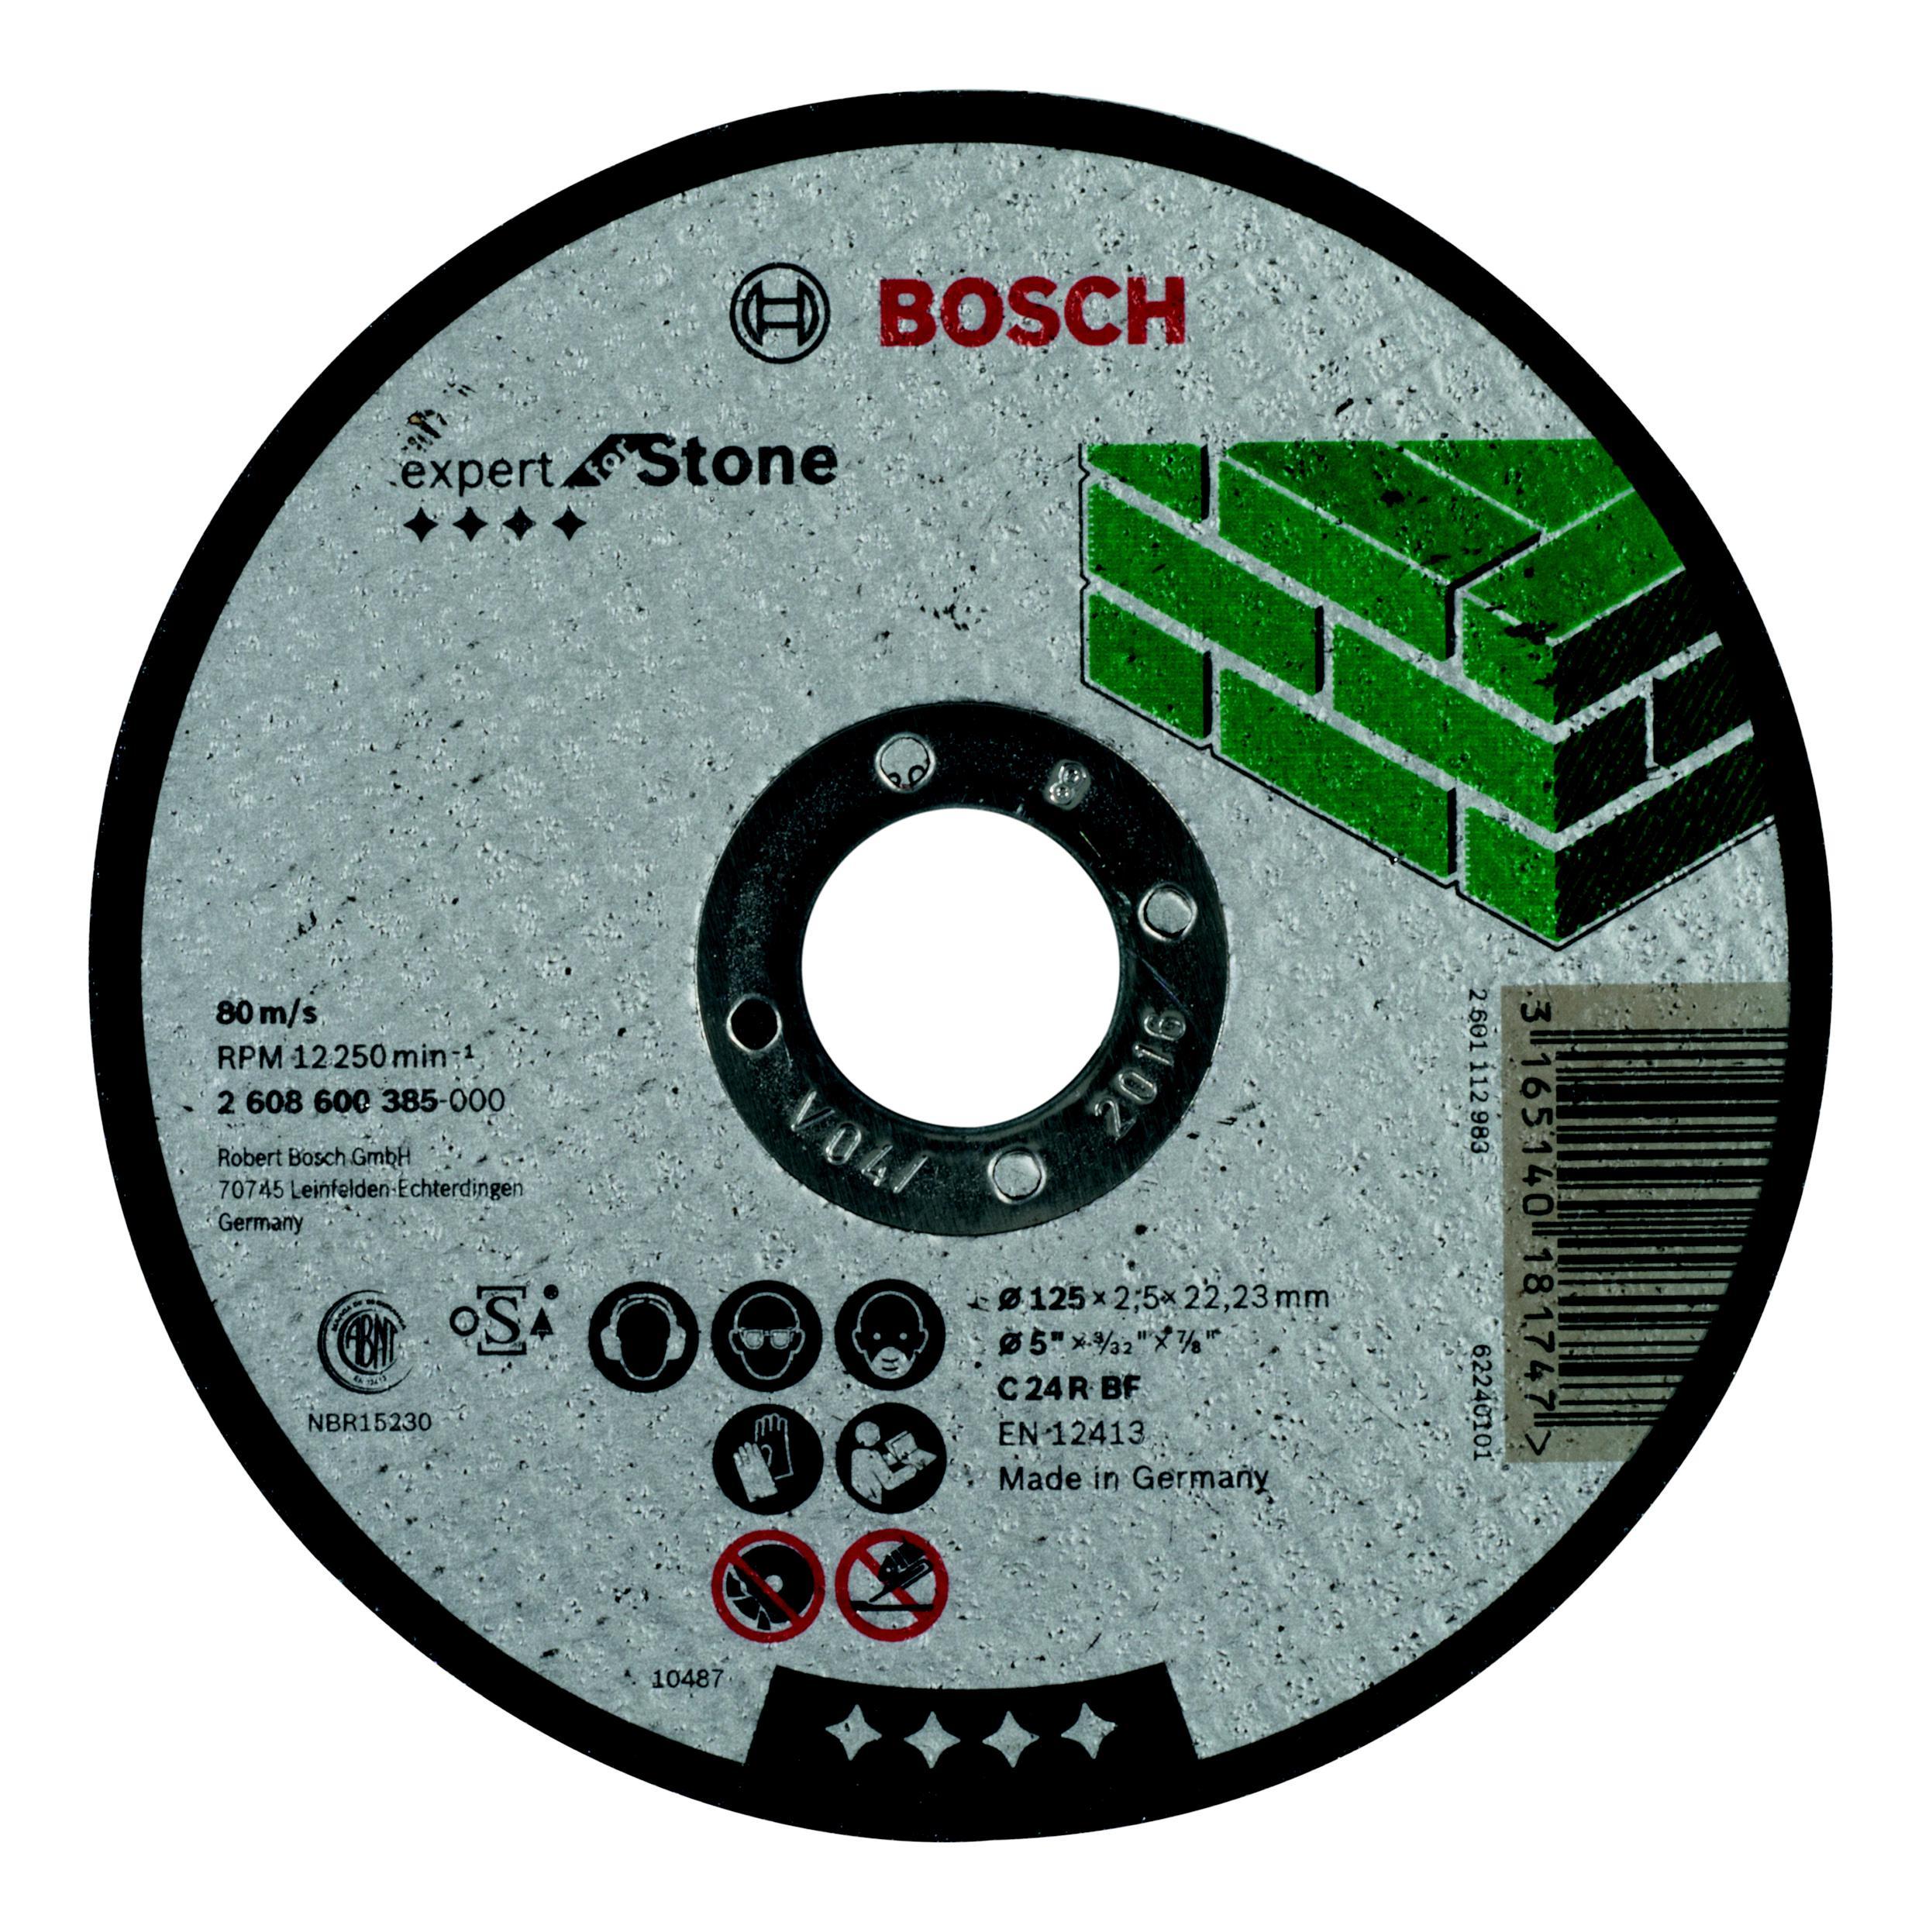 Круг отрезной Bosch 125х2.5х22 expert for stone (2.608.600.385) круг отрезной bosch expert for metal 230x1 9x22 2 608 603 400